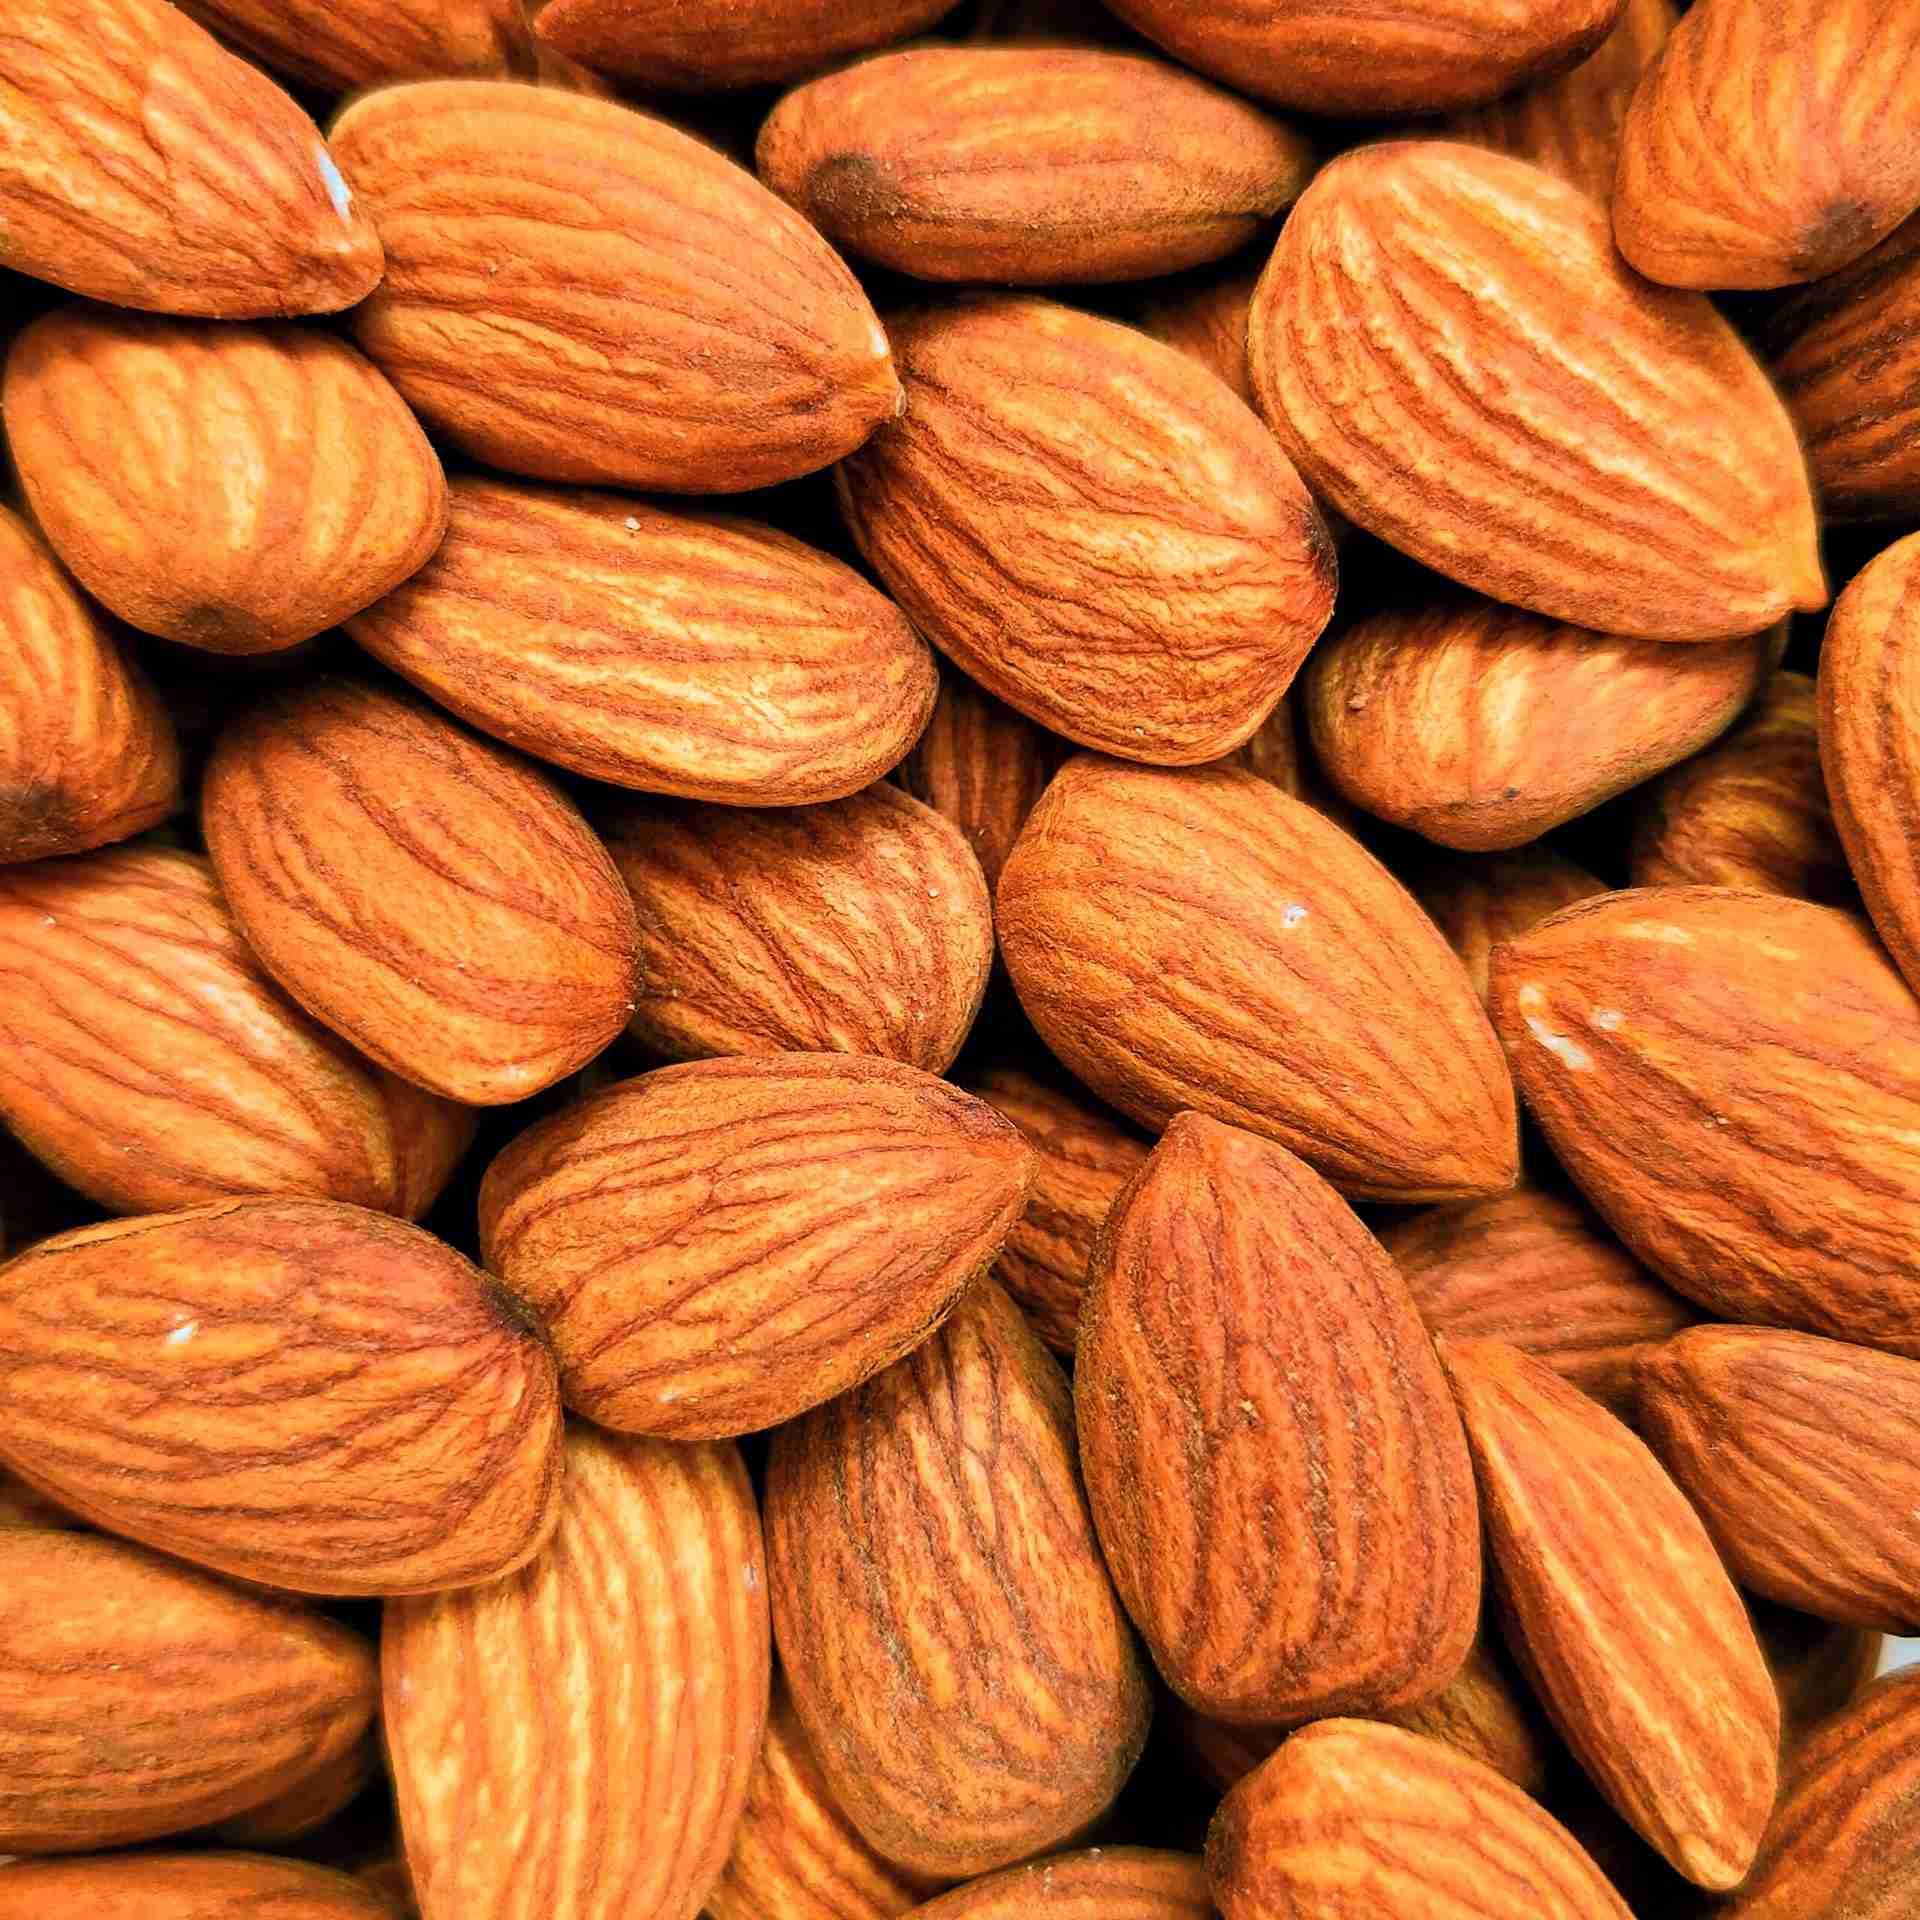 Benefits of walnut (2021)